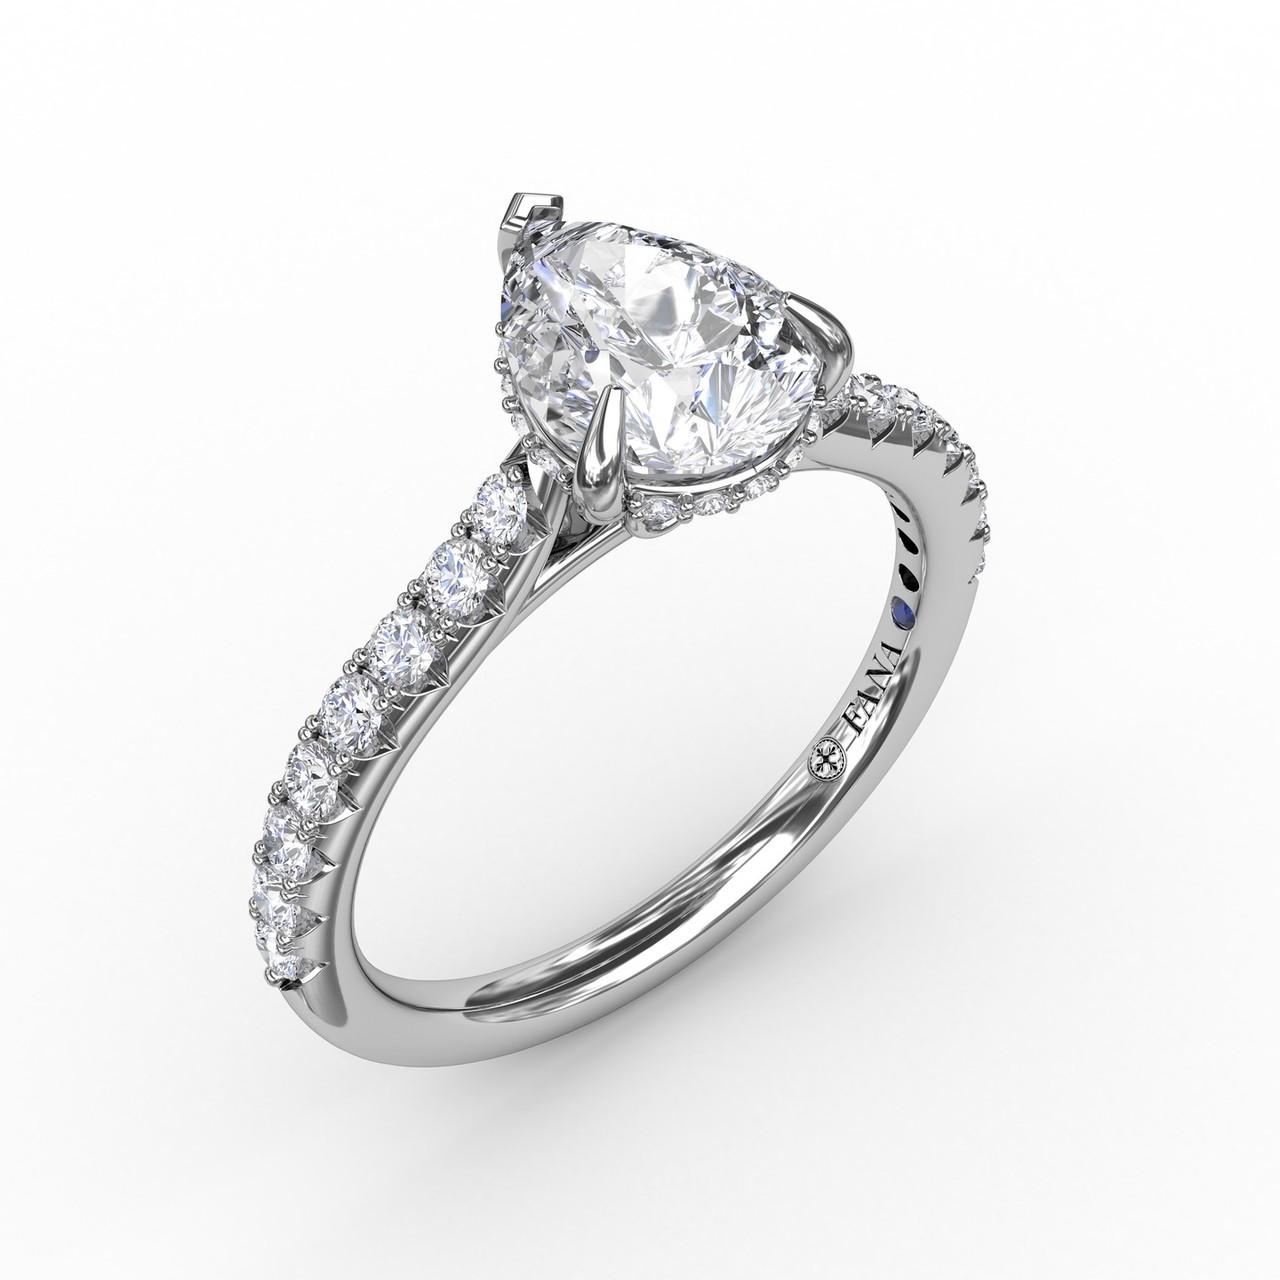 Classic Pear Shape Engagement Ring with a Subtle Diamond Splash